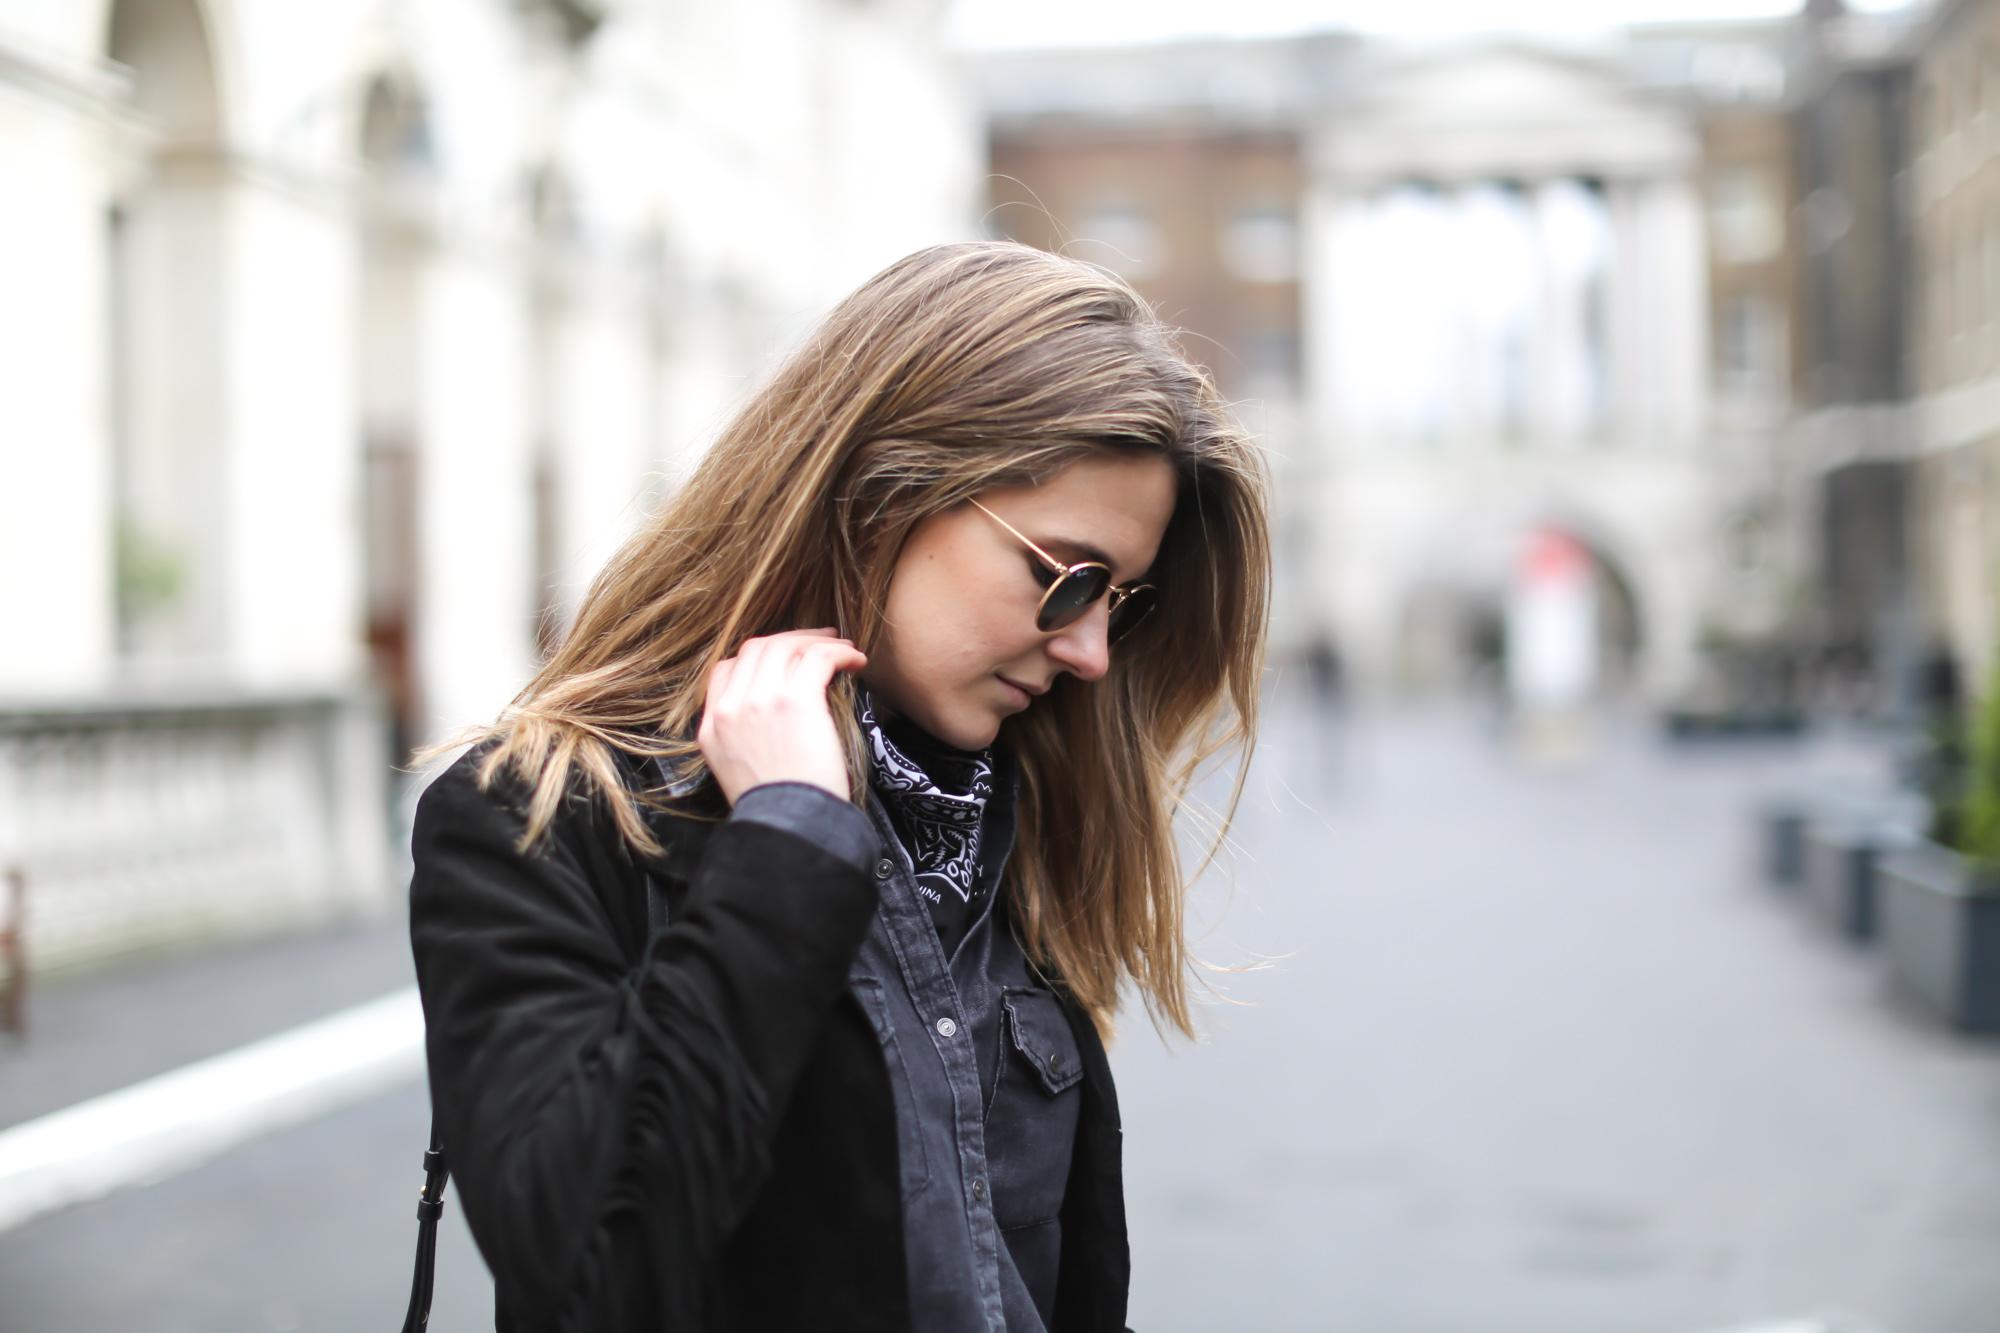 Clochet-streetstyle-lfw-london-fashion-week-maje-fringed-suede-jacket-cowboy-boots-7